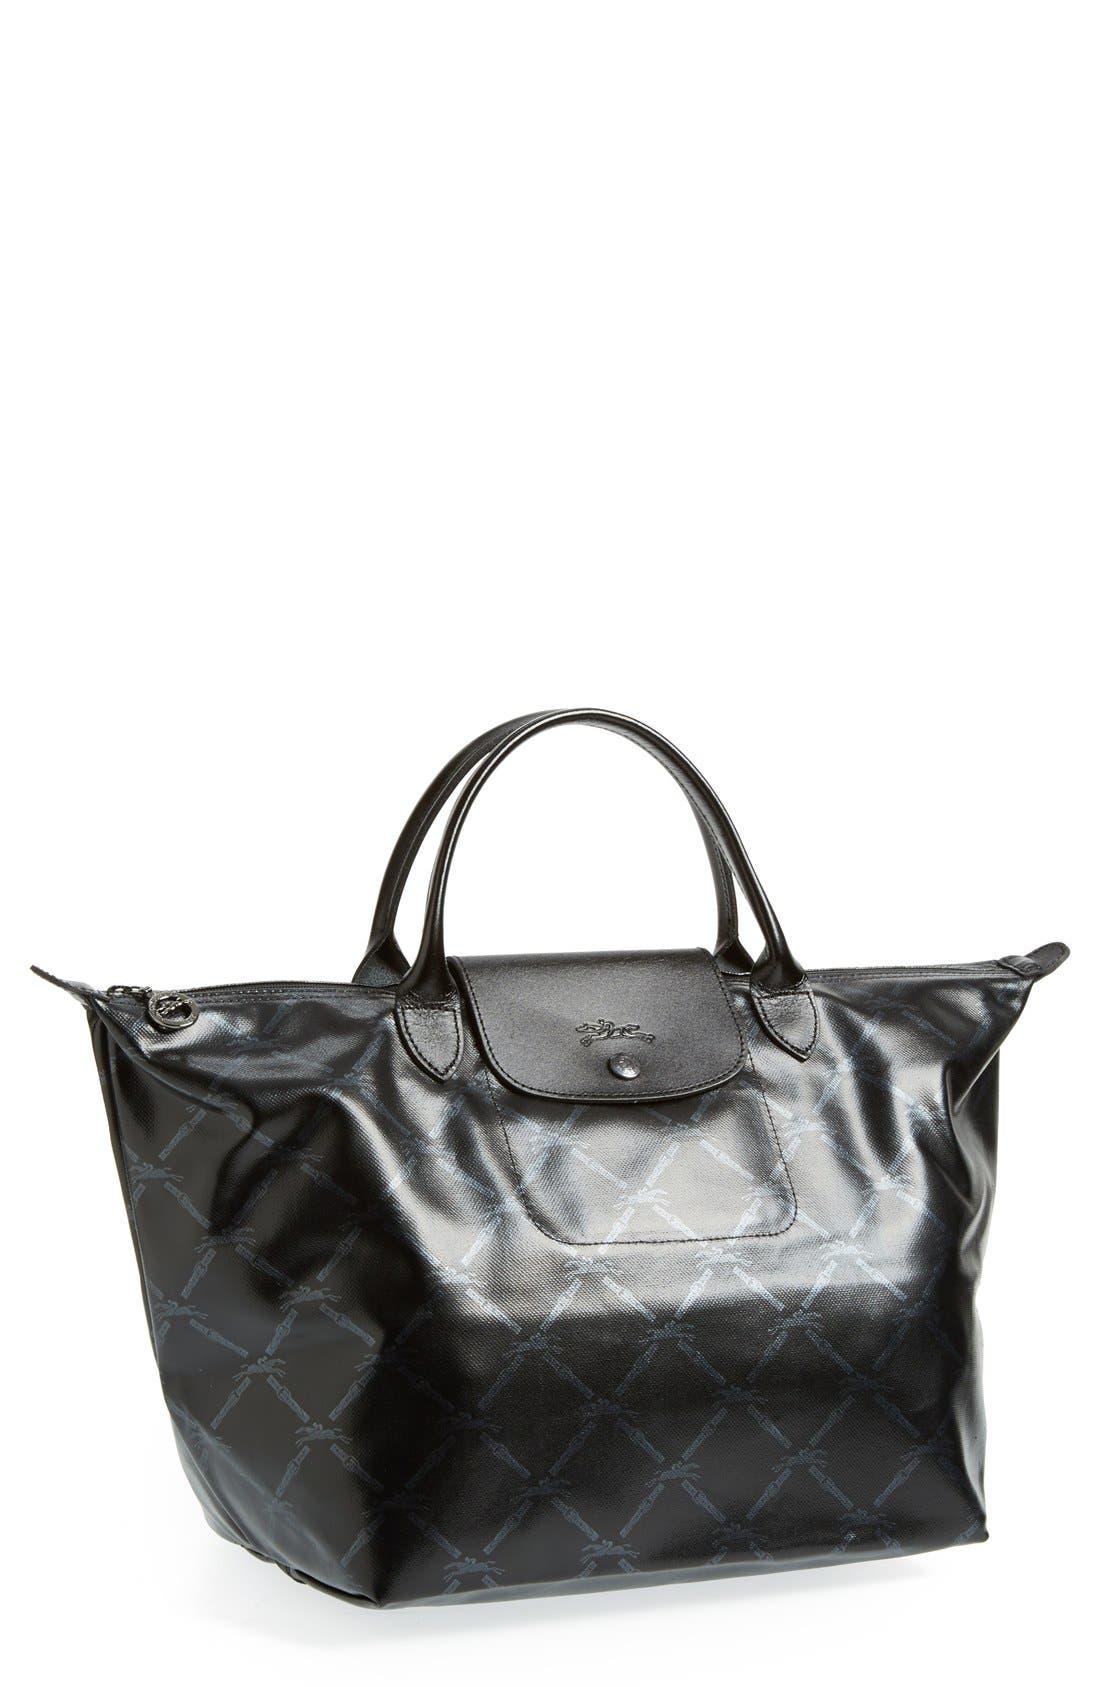 'LM Metal' Handbag,                             Main thumbnail 1, color,                             001